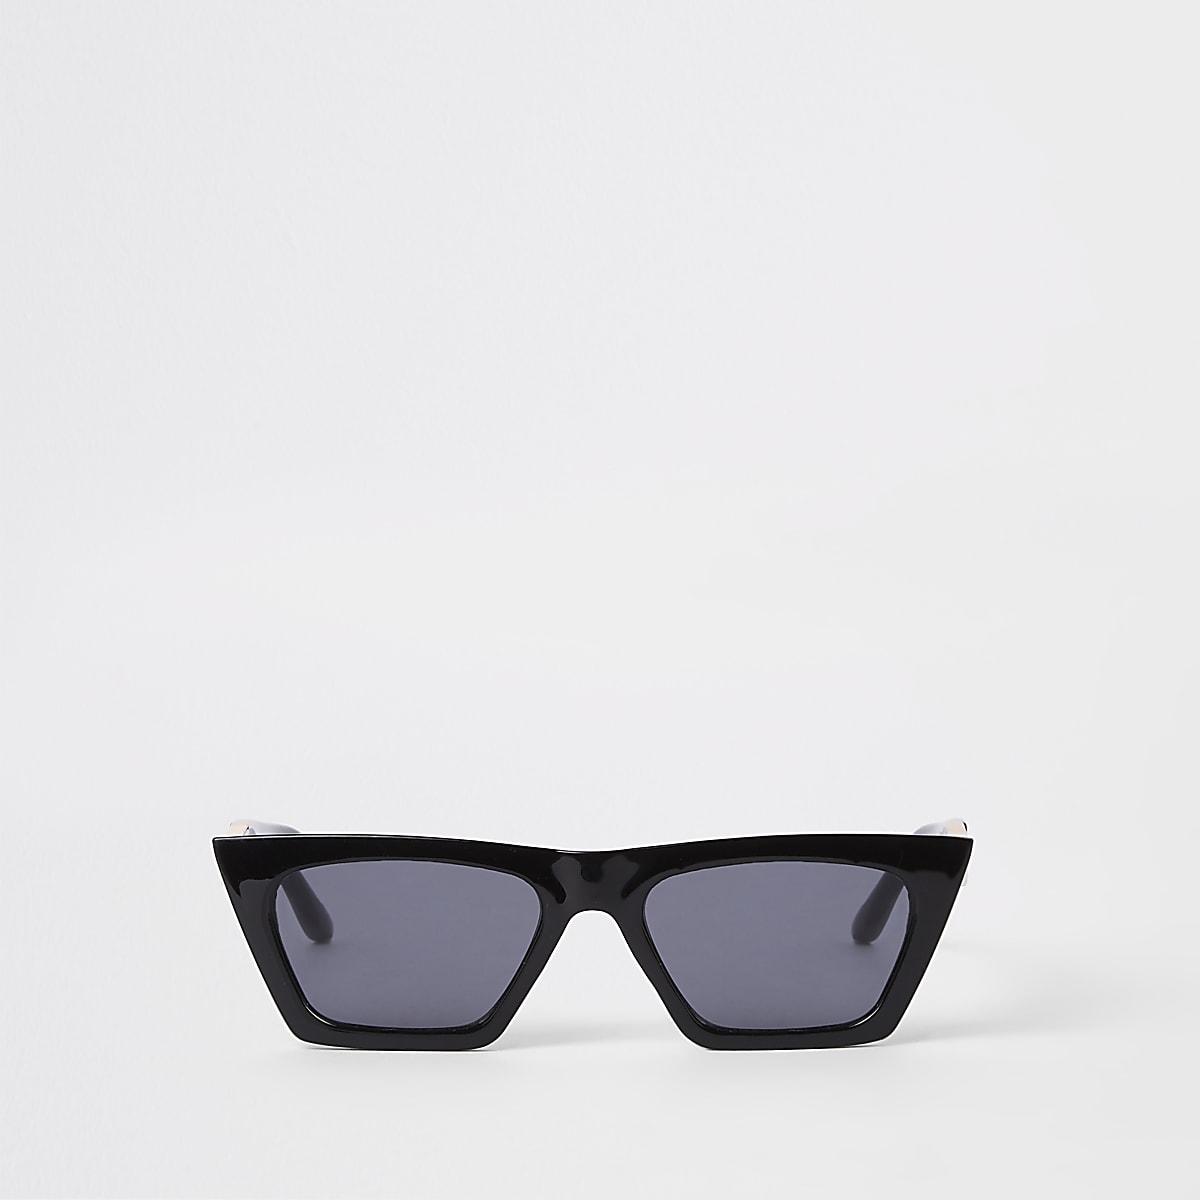 Black smoke lens visor sunglasses